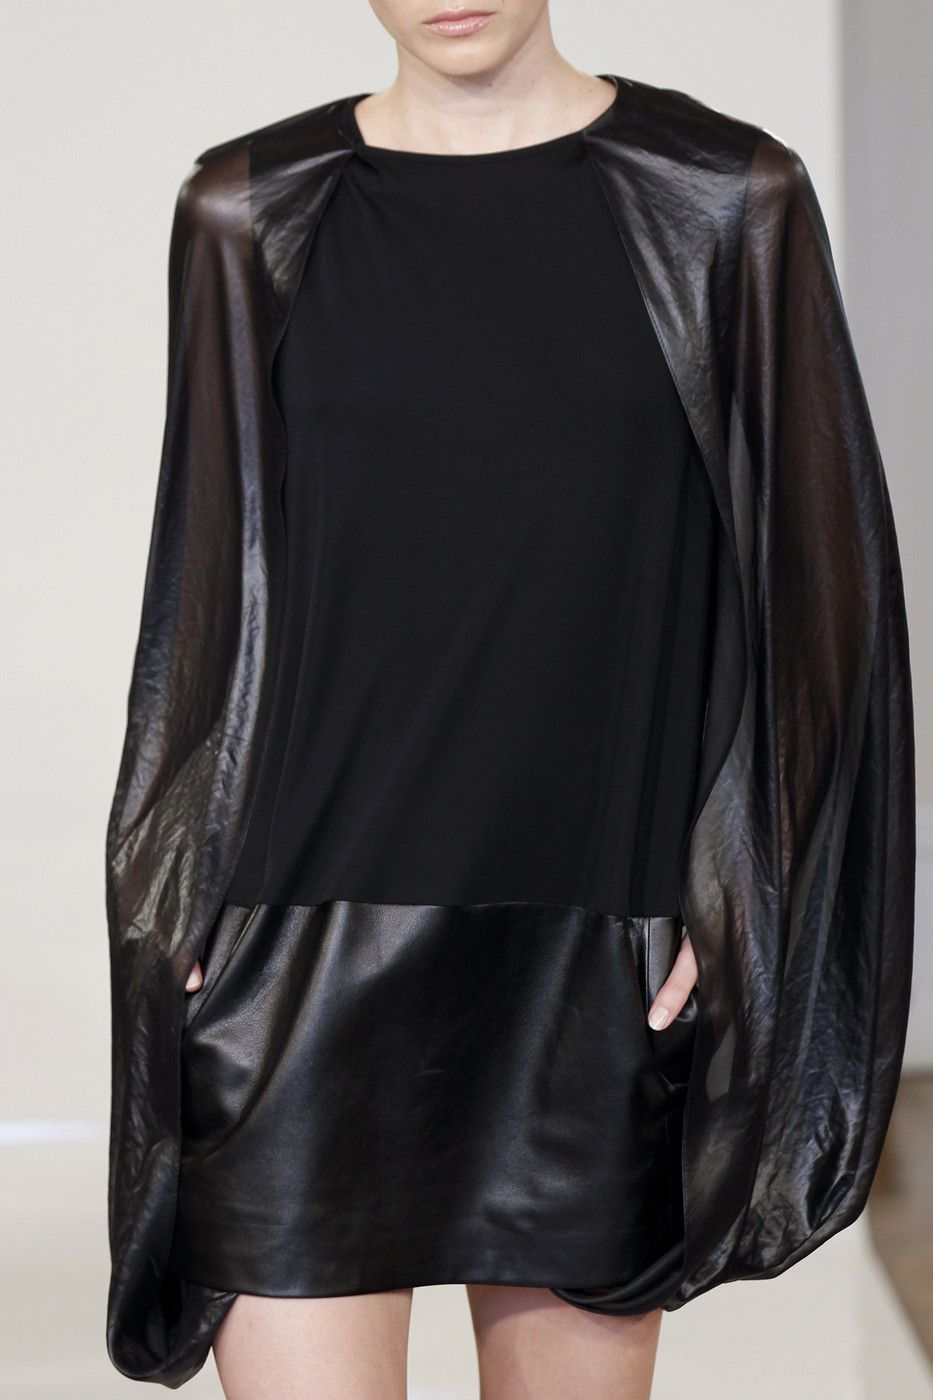 runway detail #fashion #avantgarde#black #trends #style #wearing #fashionweek  #runway #detail